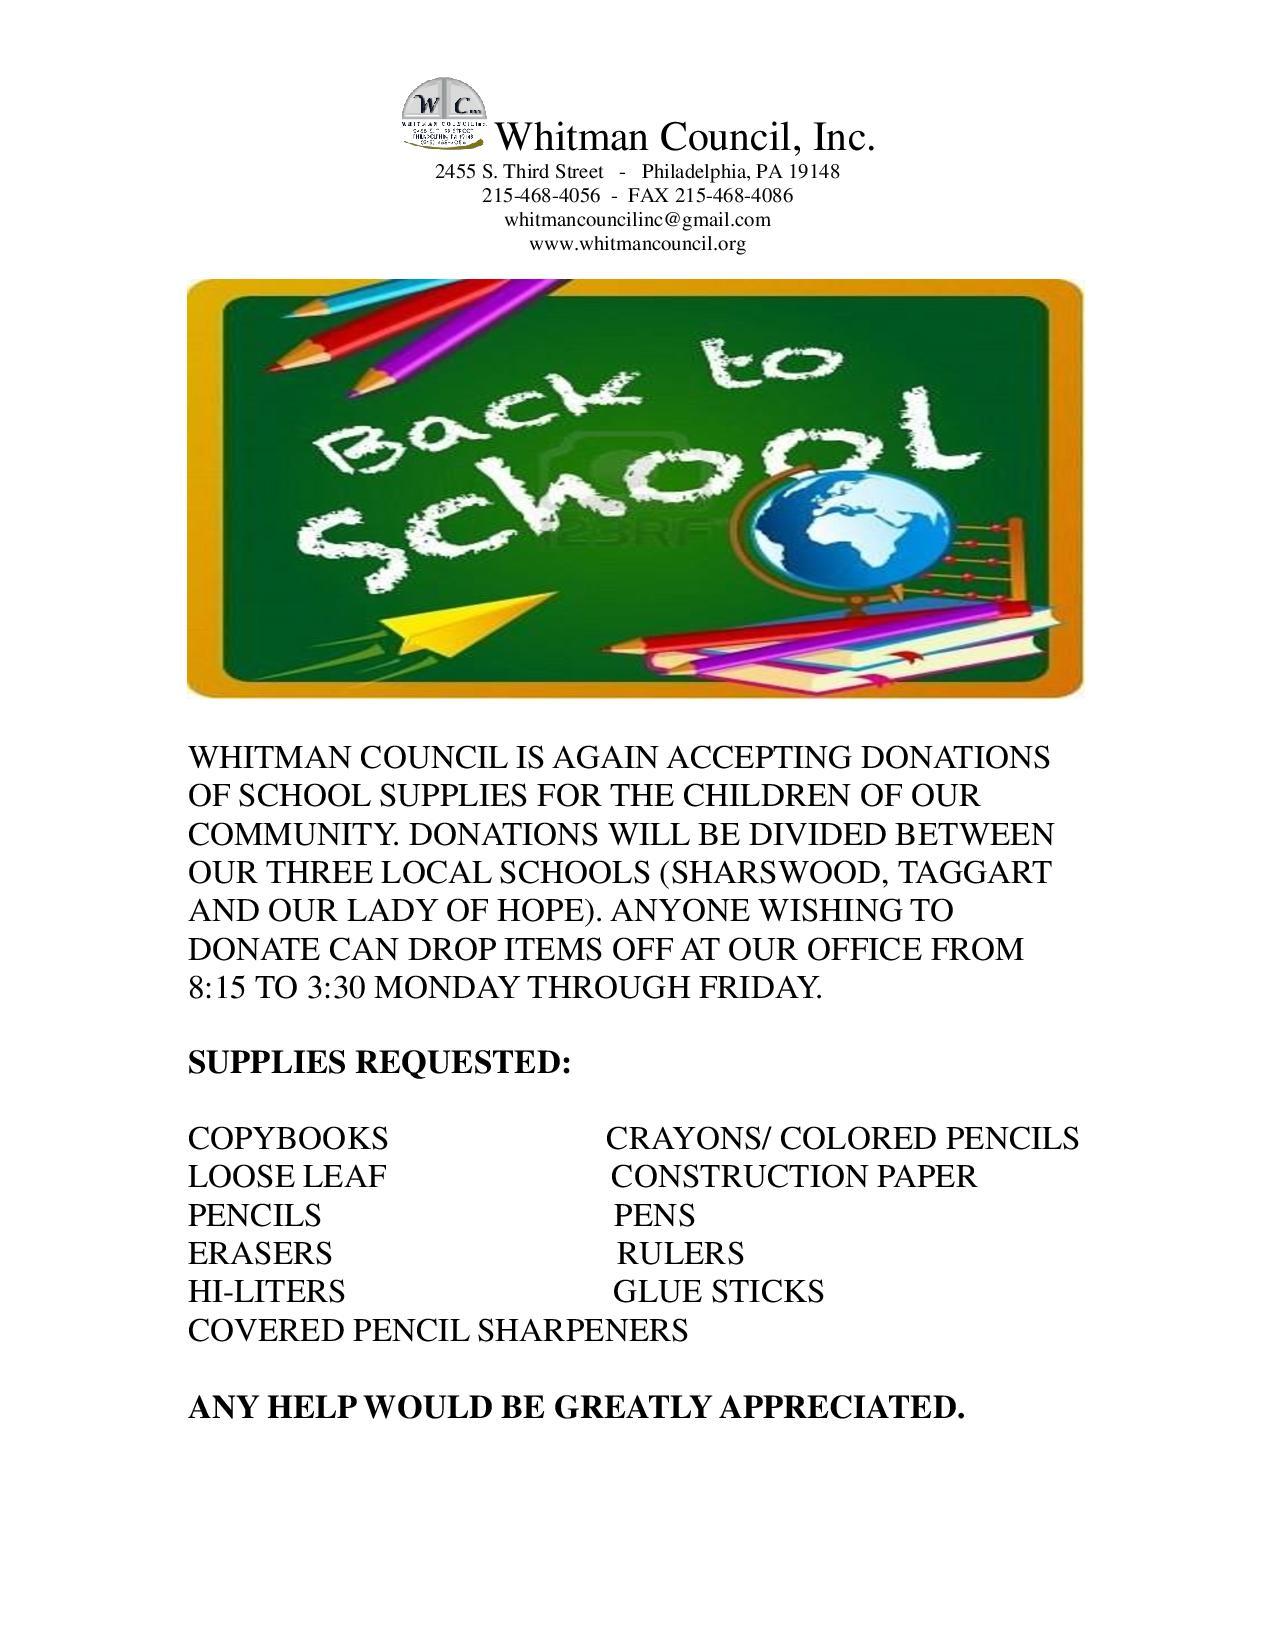 SCHOOL SUPPLIES-page-001.jpg